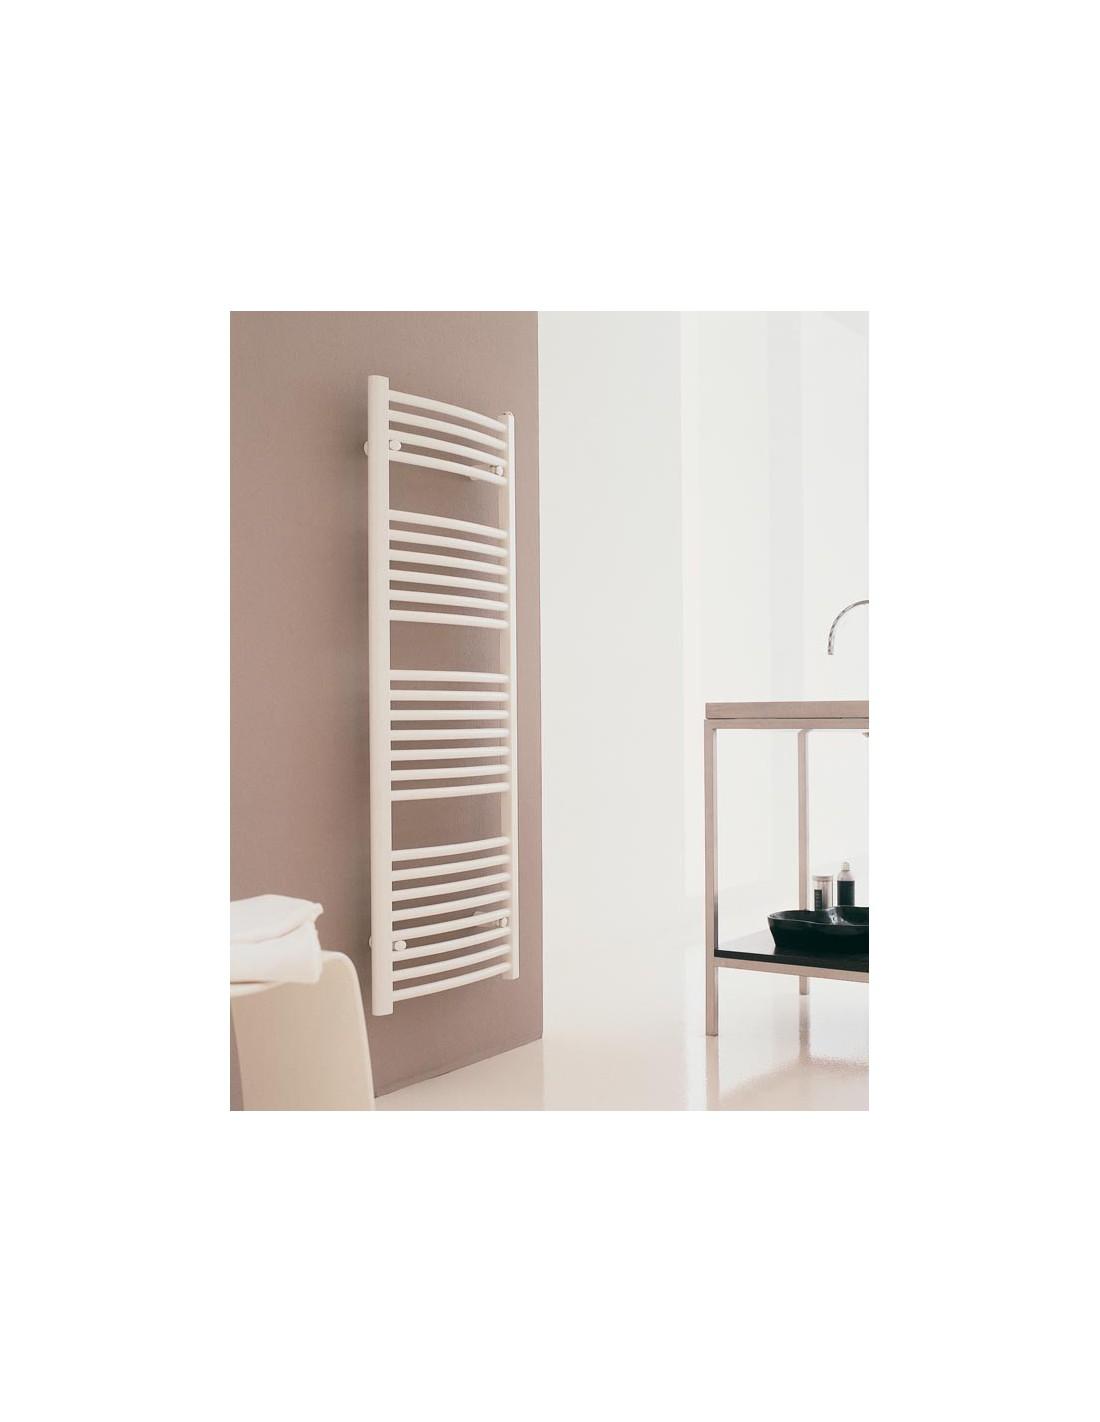 s che serviettes ondeo 439w eau chaude alterna. Black Bedroom Furniture Sets. Home Design Ideas